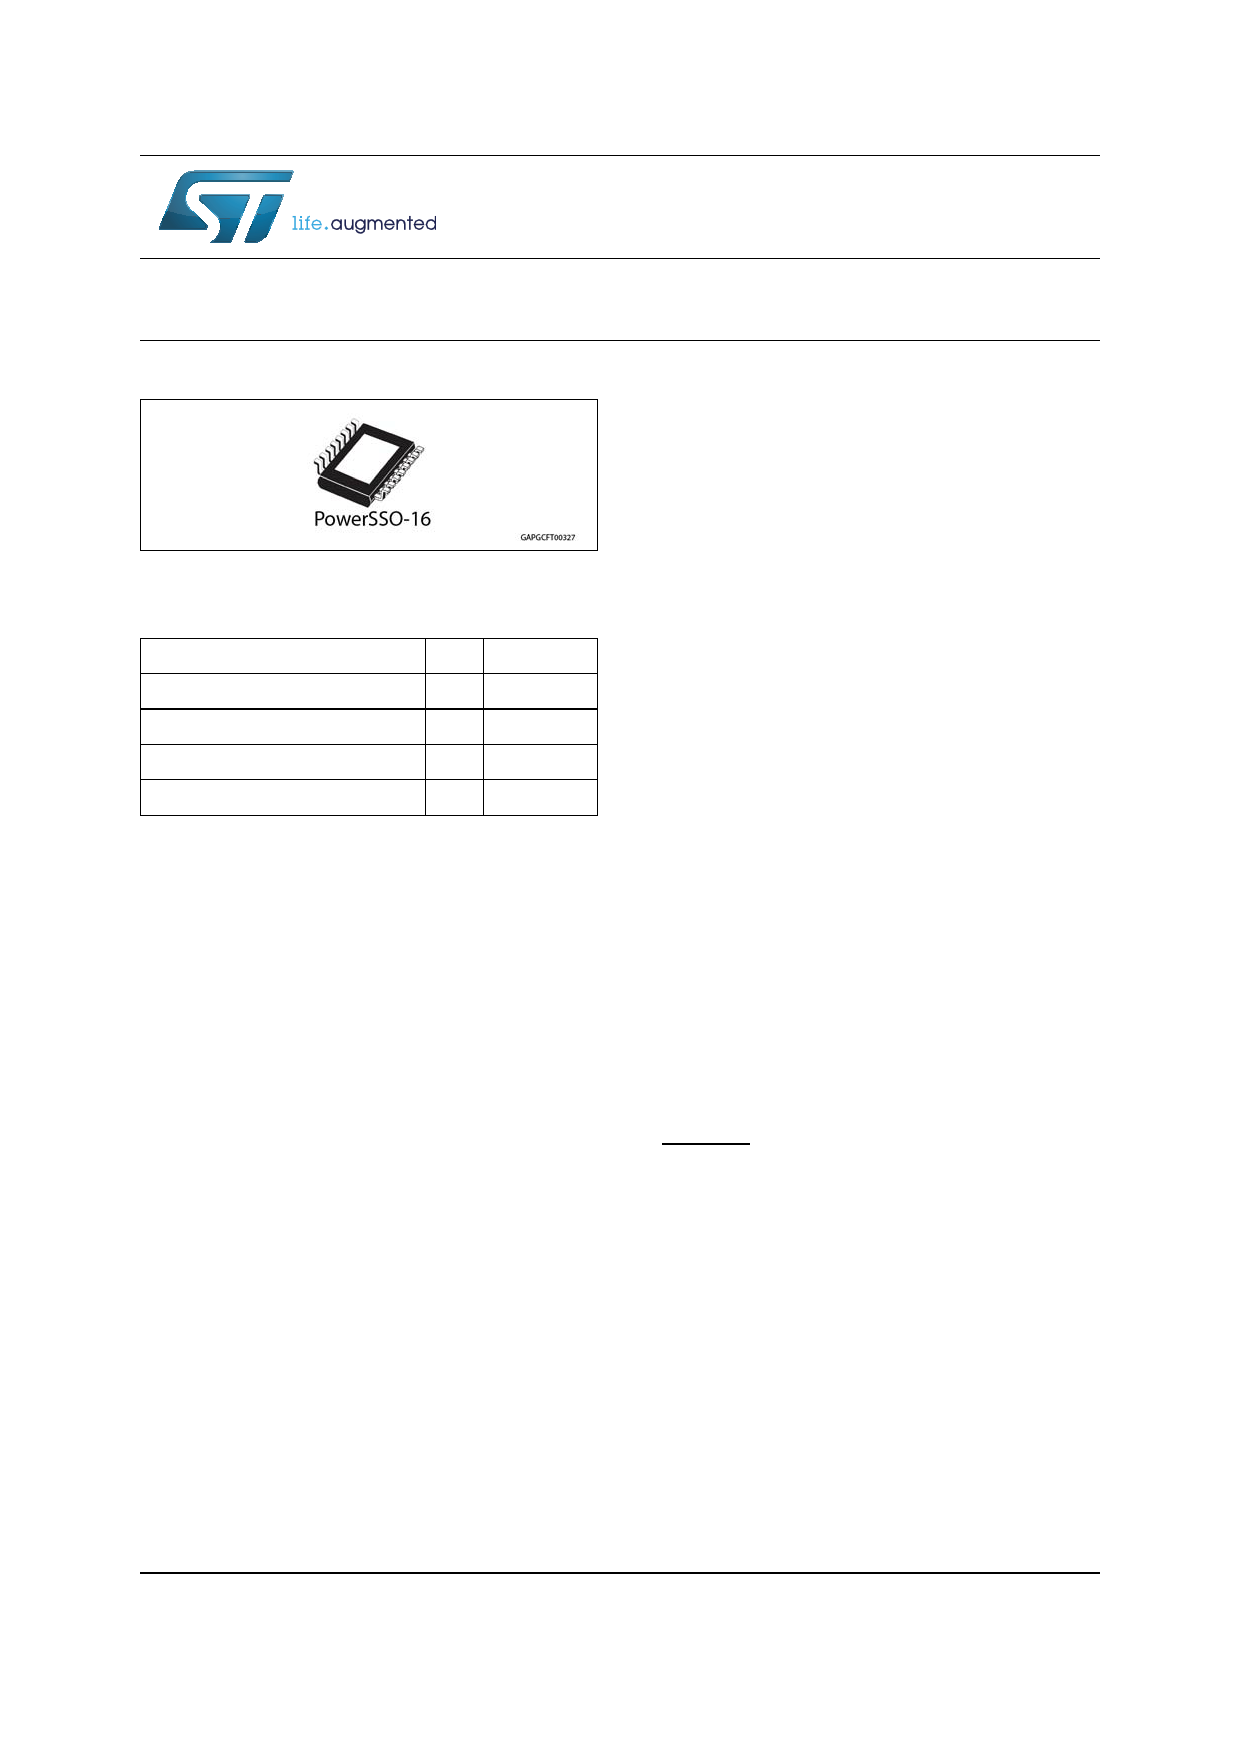 VND7140AJ-E datasheet, circuit